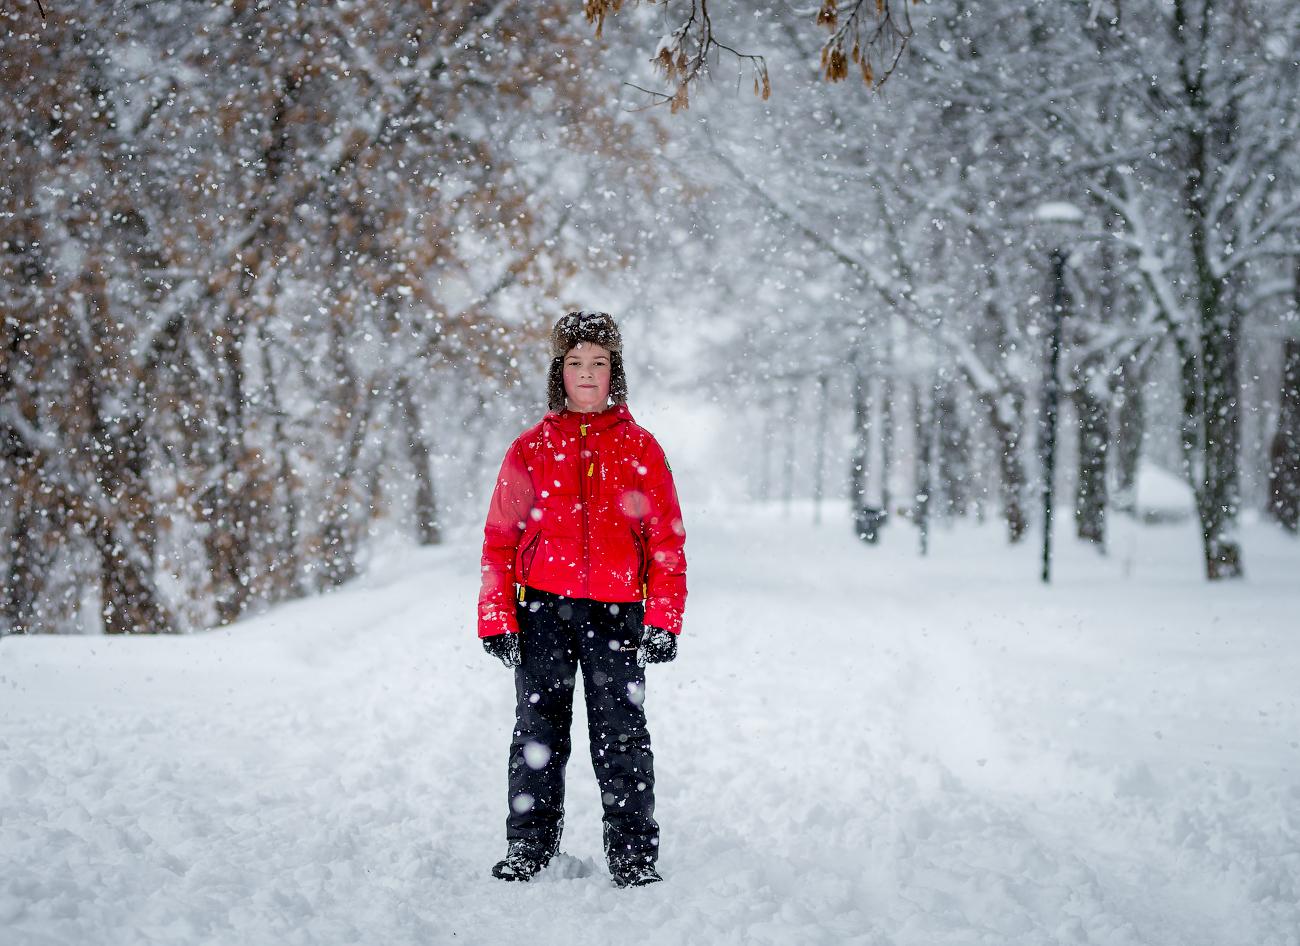 Прогулка в снегопад (НН, 03.12.2017)